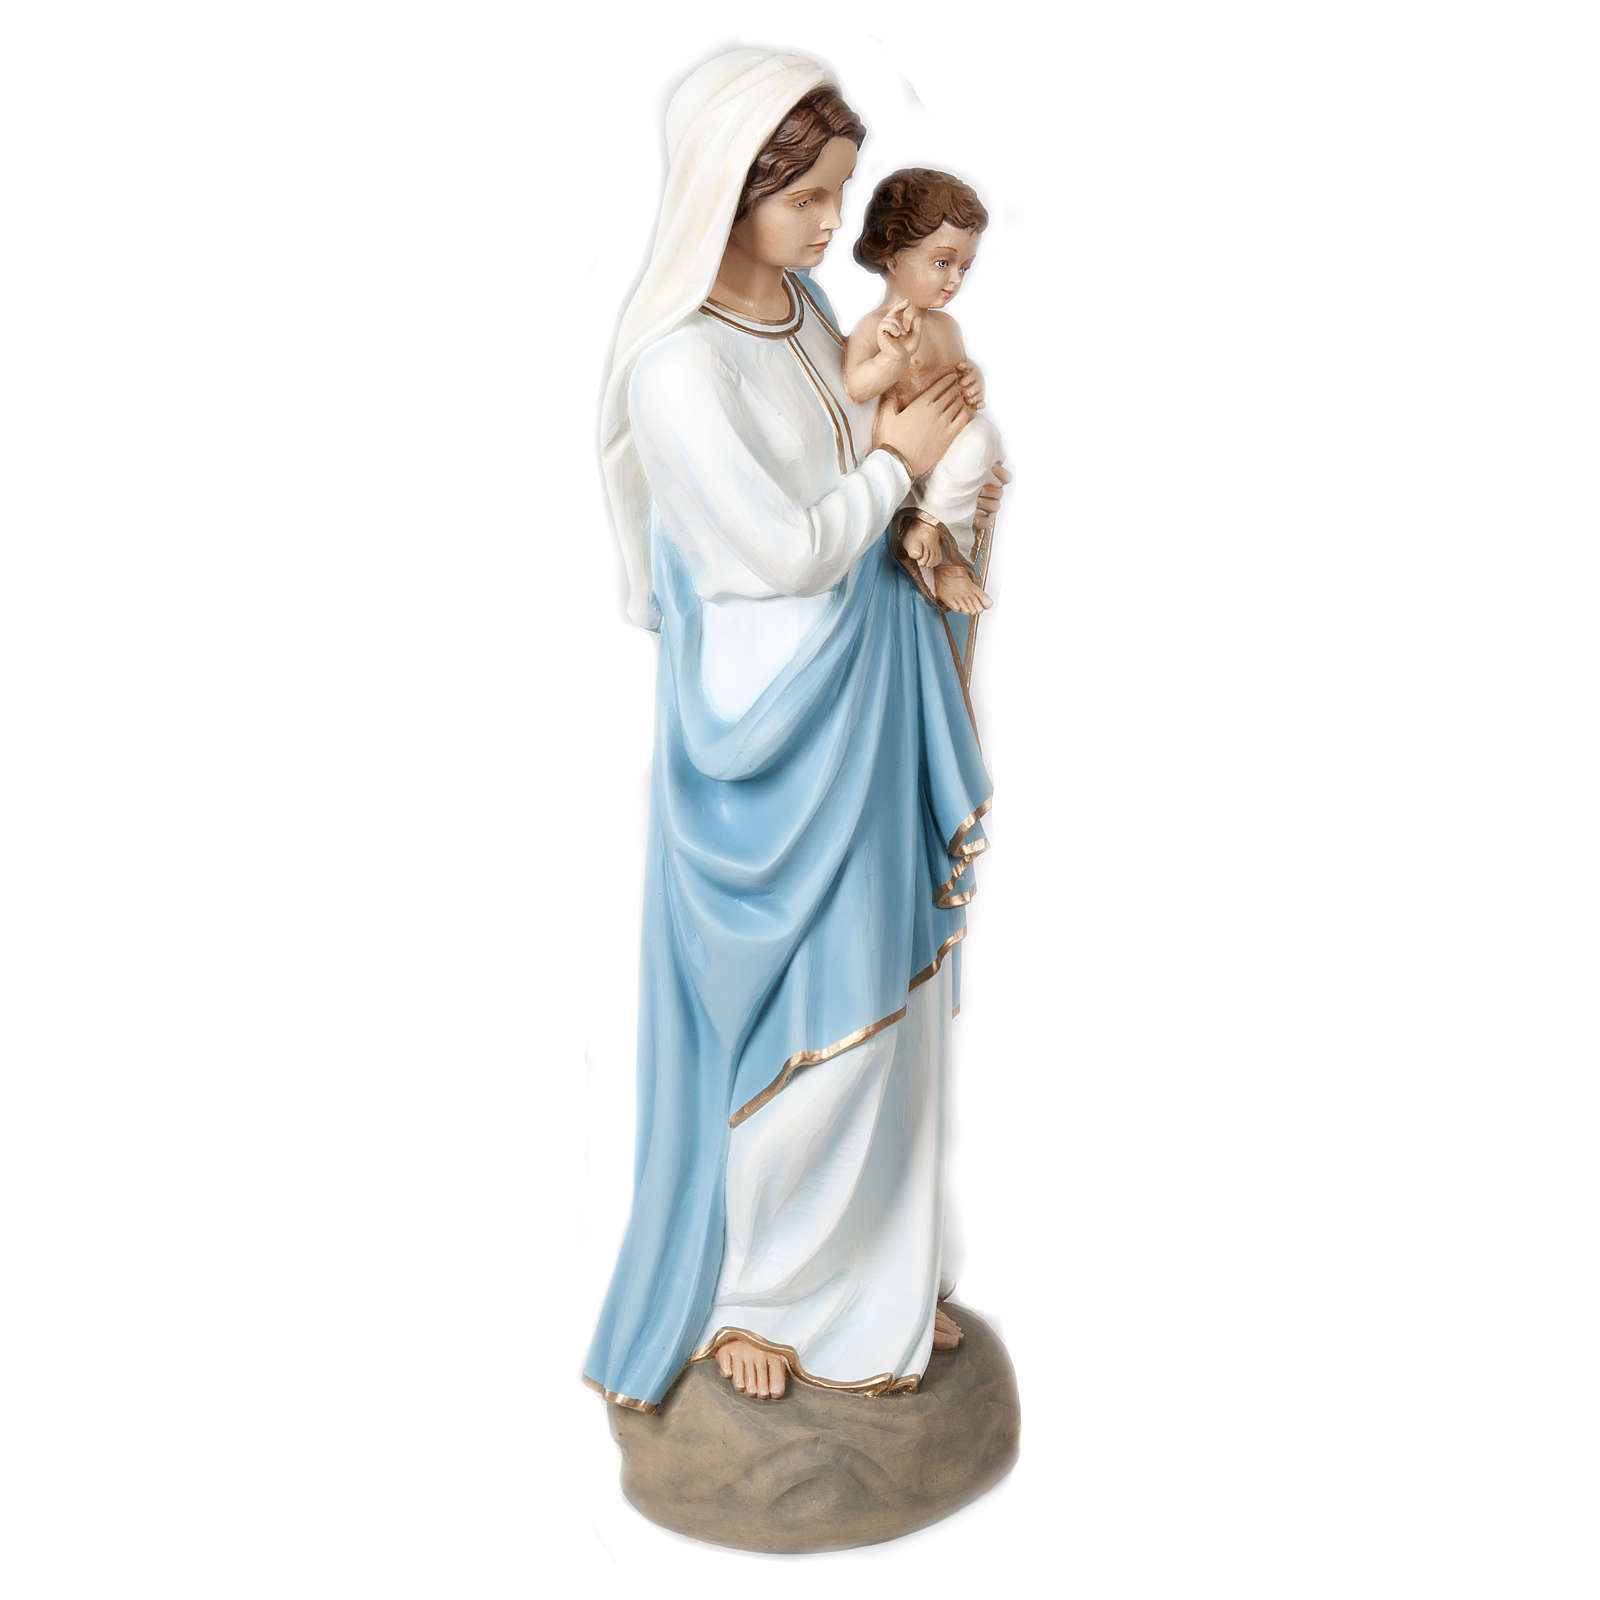 Estatua Virgen con Niño que bendice 85 cm fiberglass PARA EXTERIOR 4